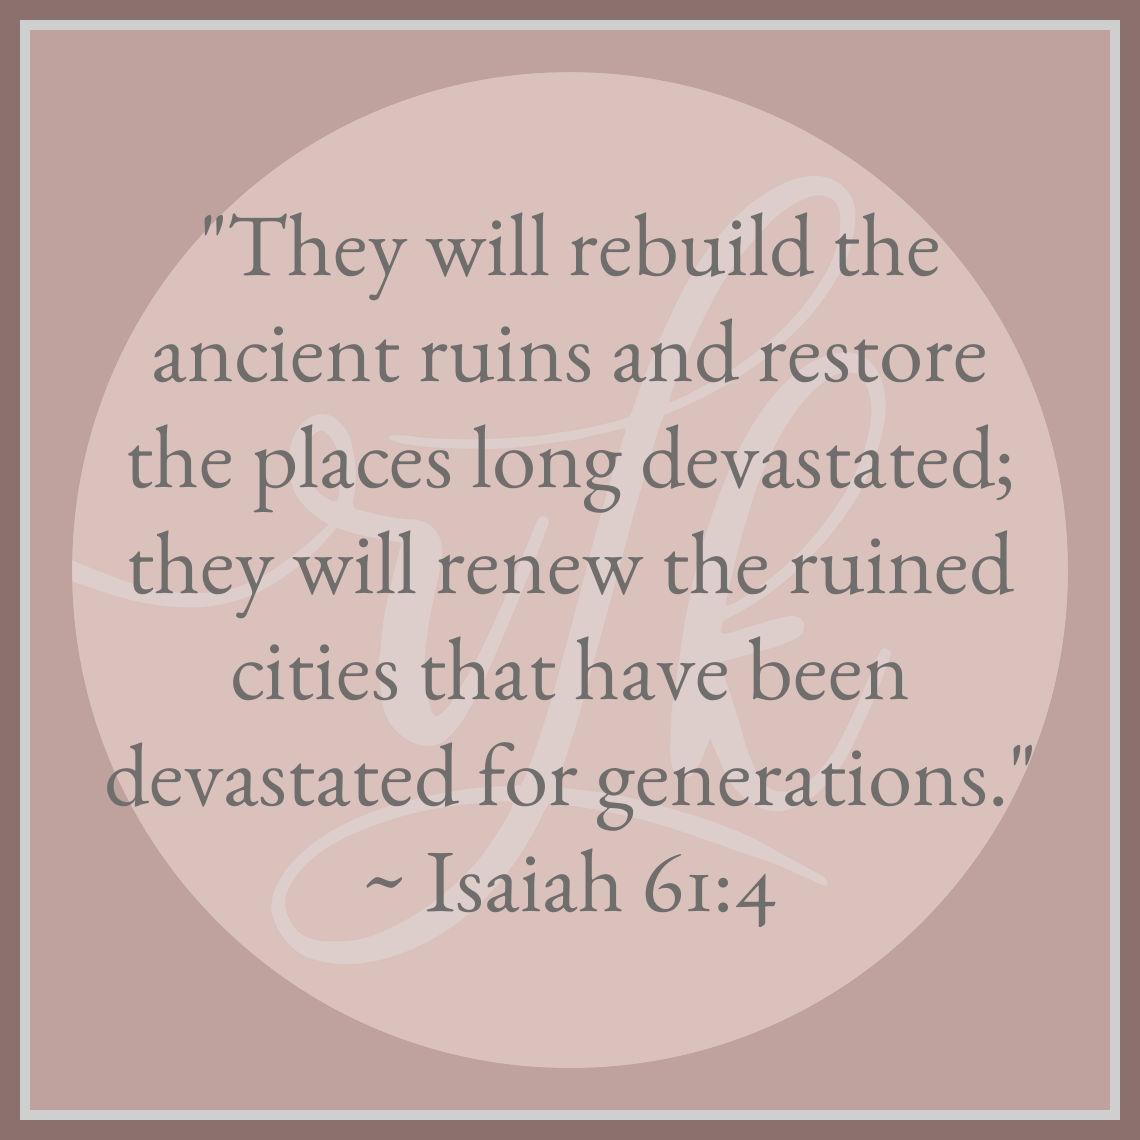 Isaiah 61:4